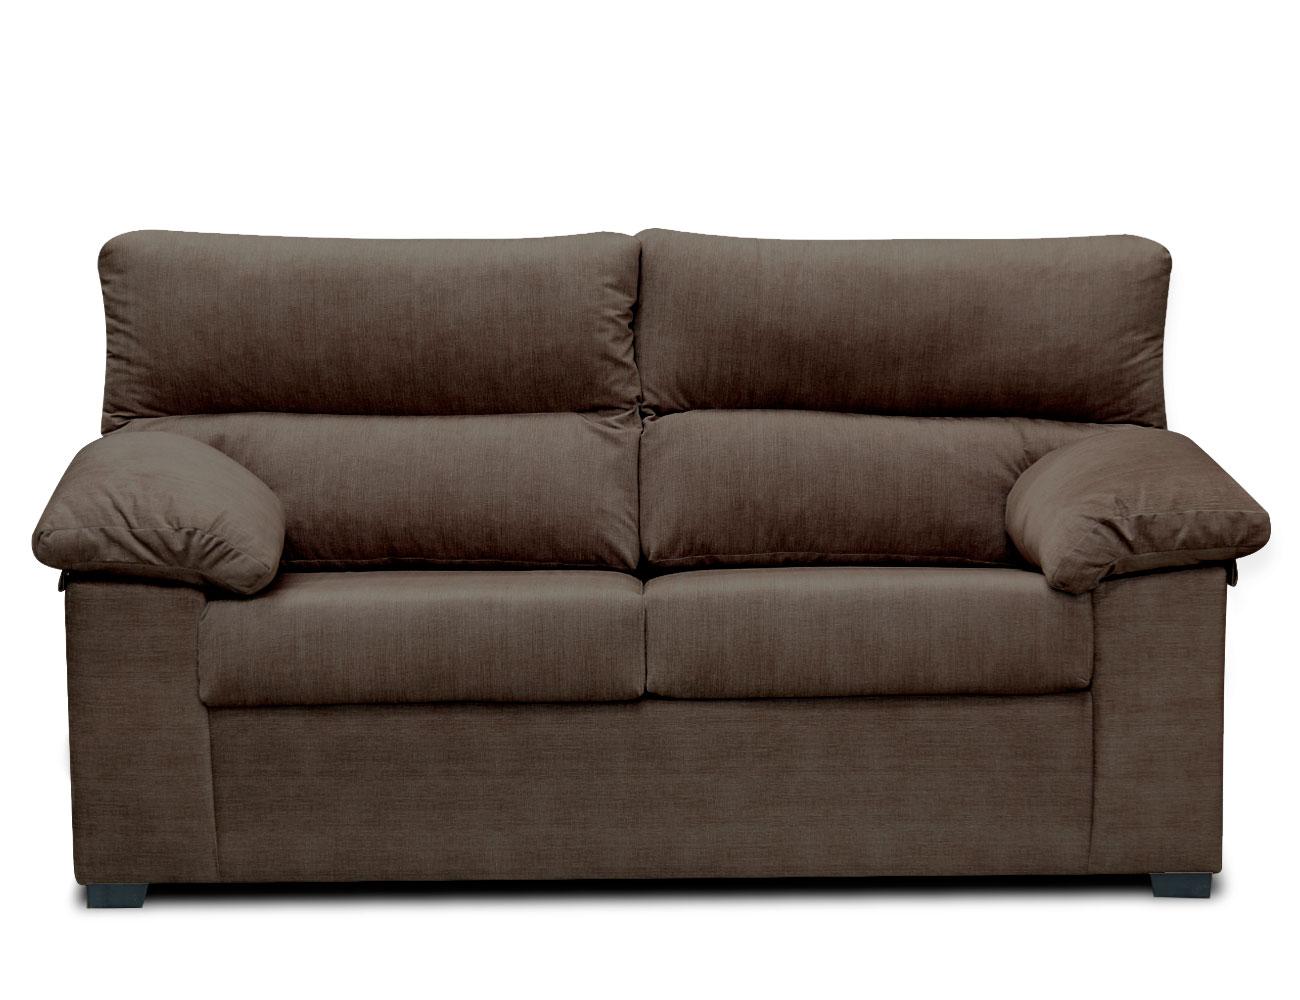 Sofa 3 plazas indiana trufa 2